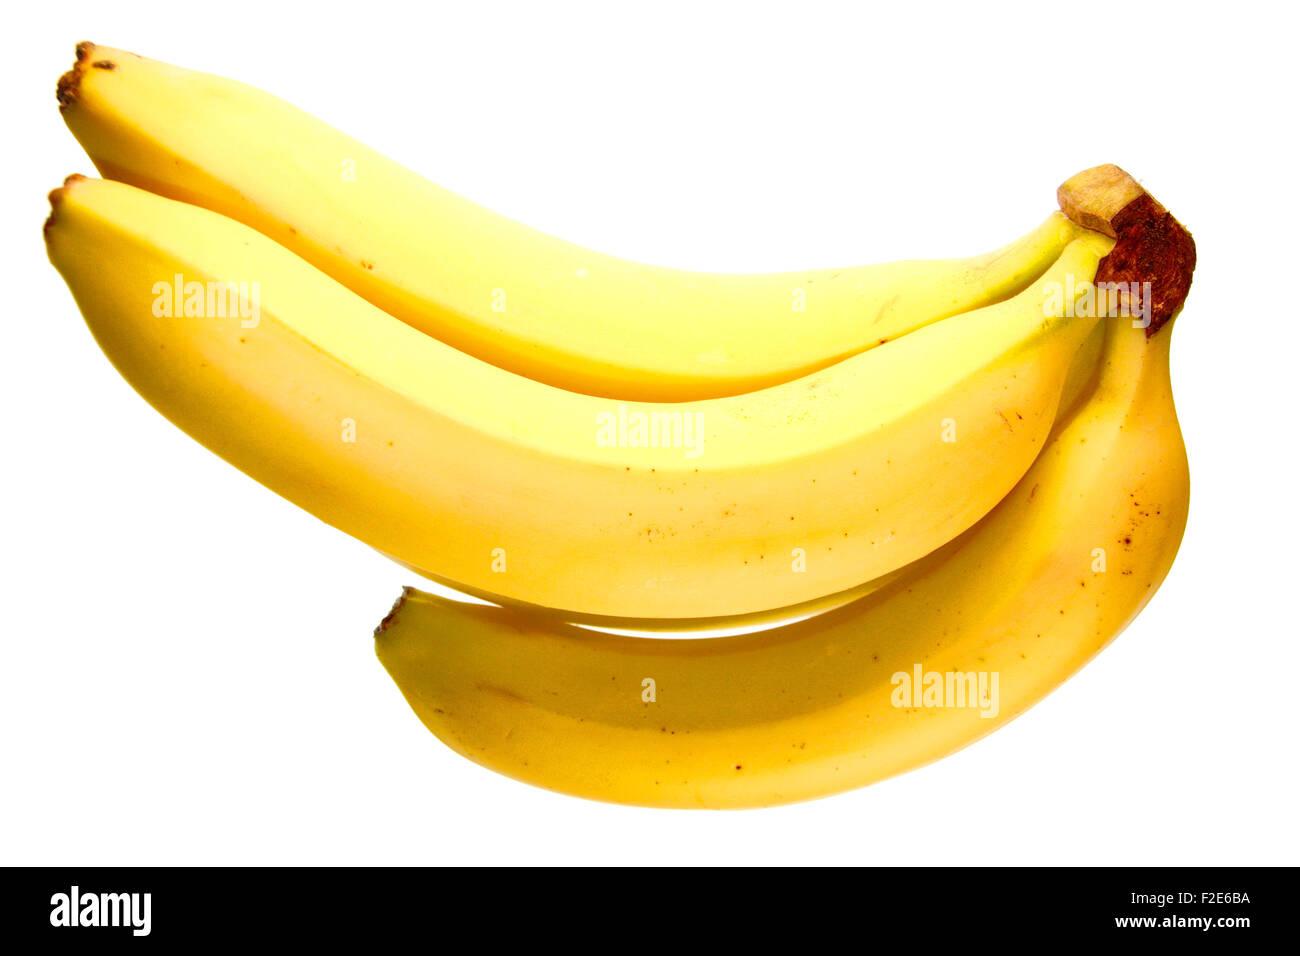 Bananen / bananas - Symbolbild Nahrungsmittel. Stock Photo